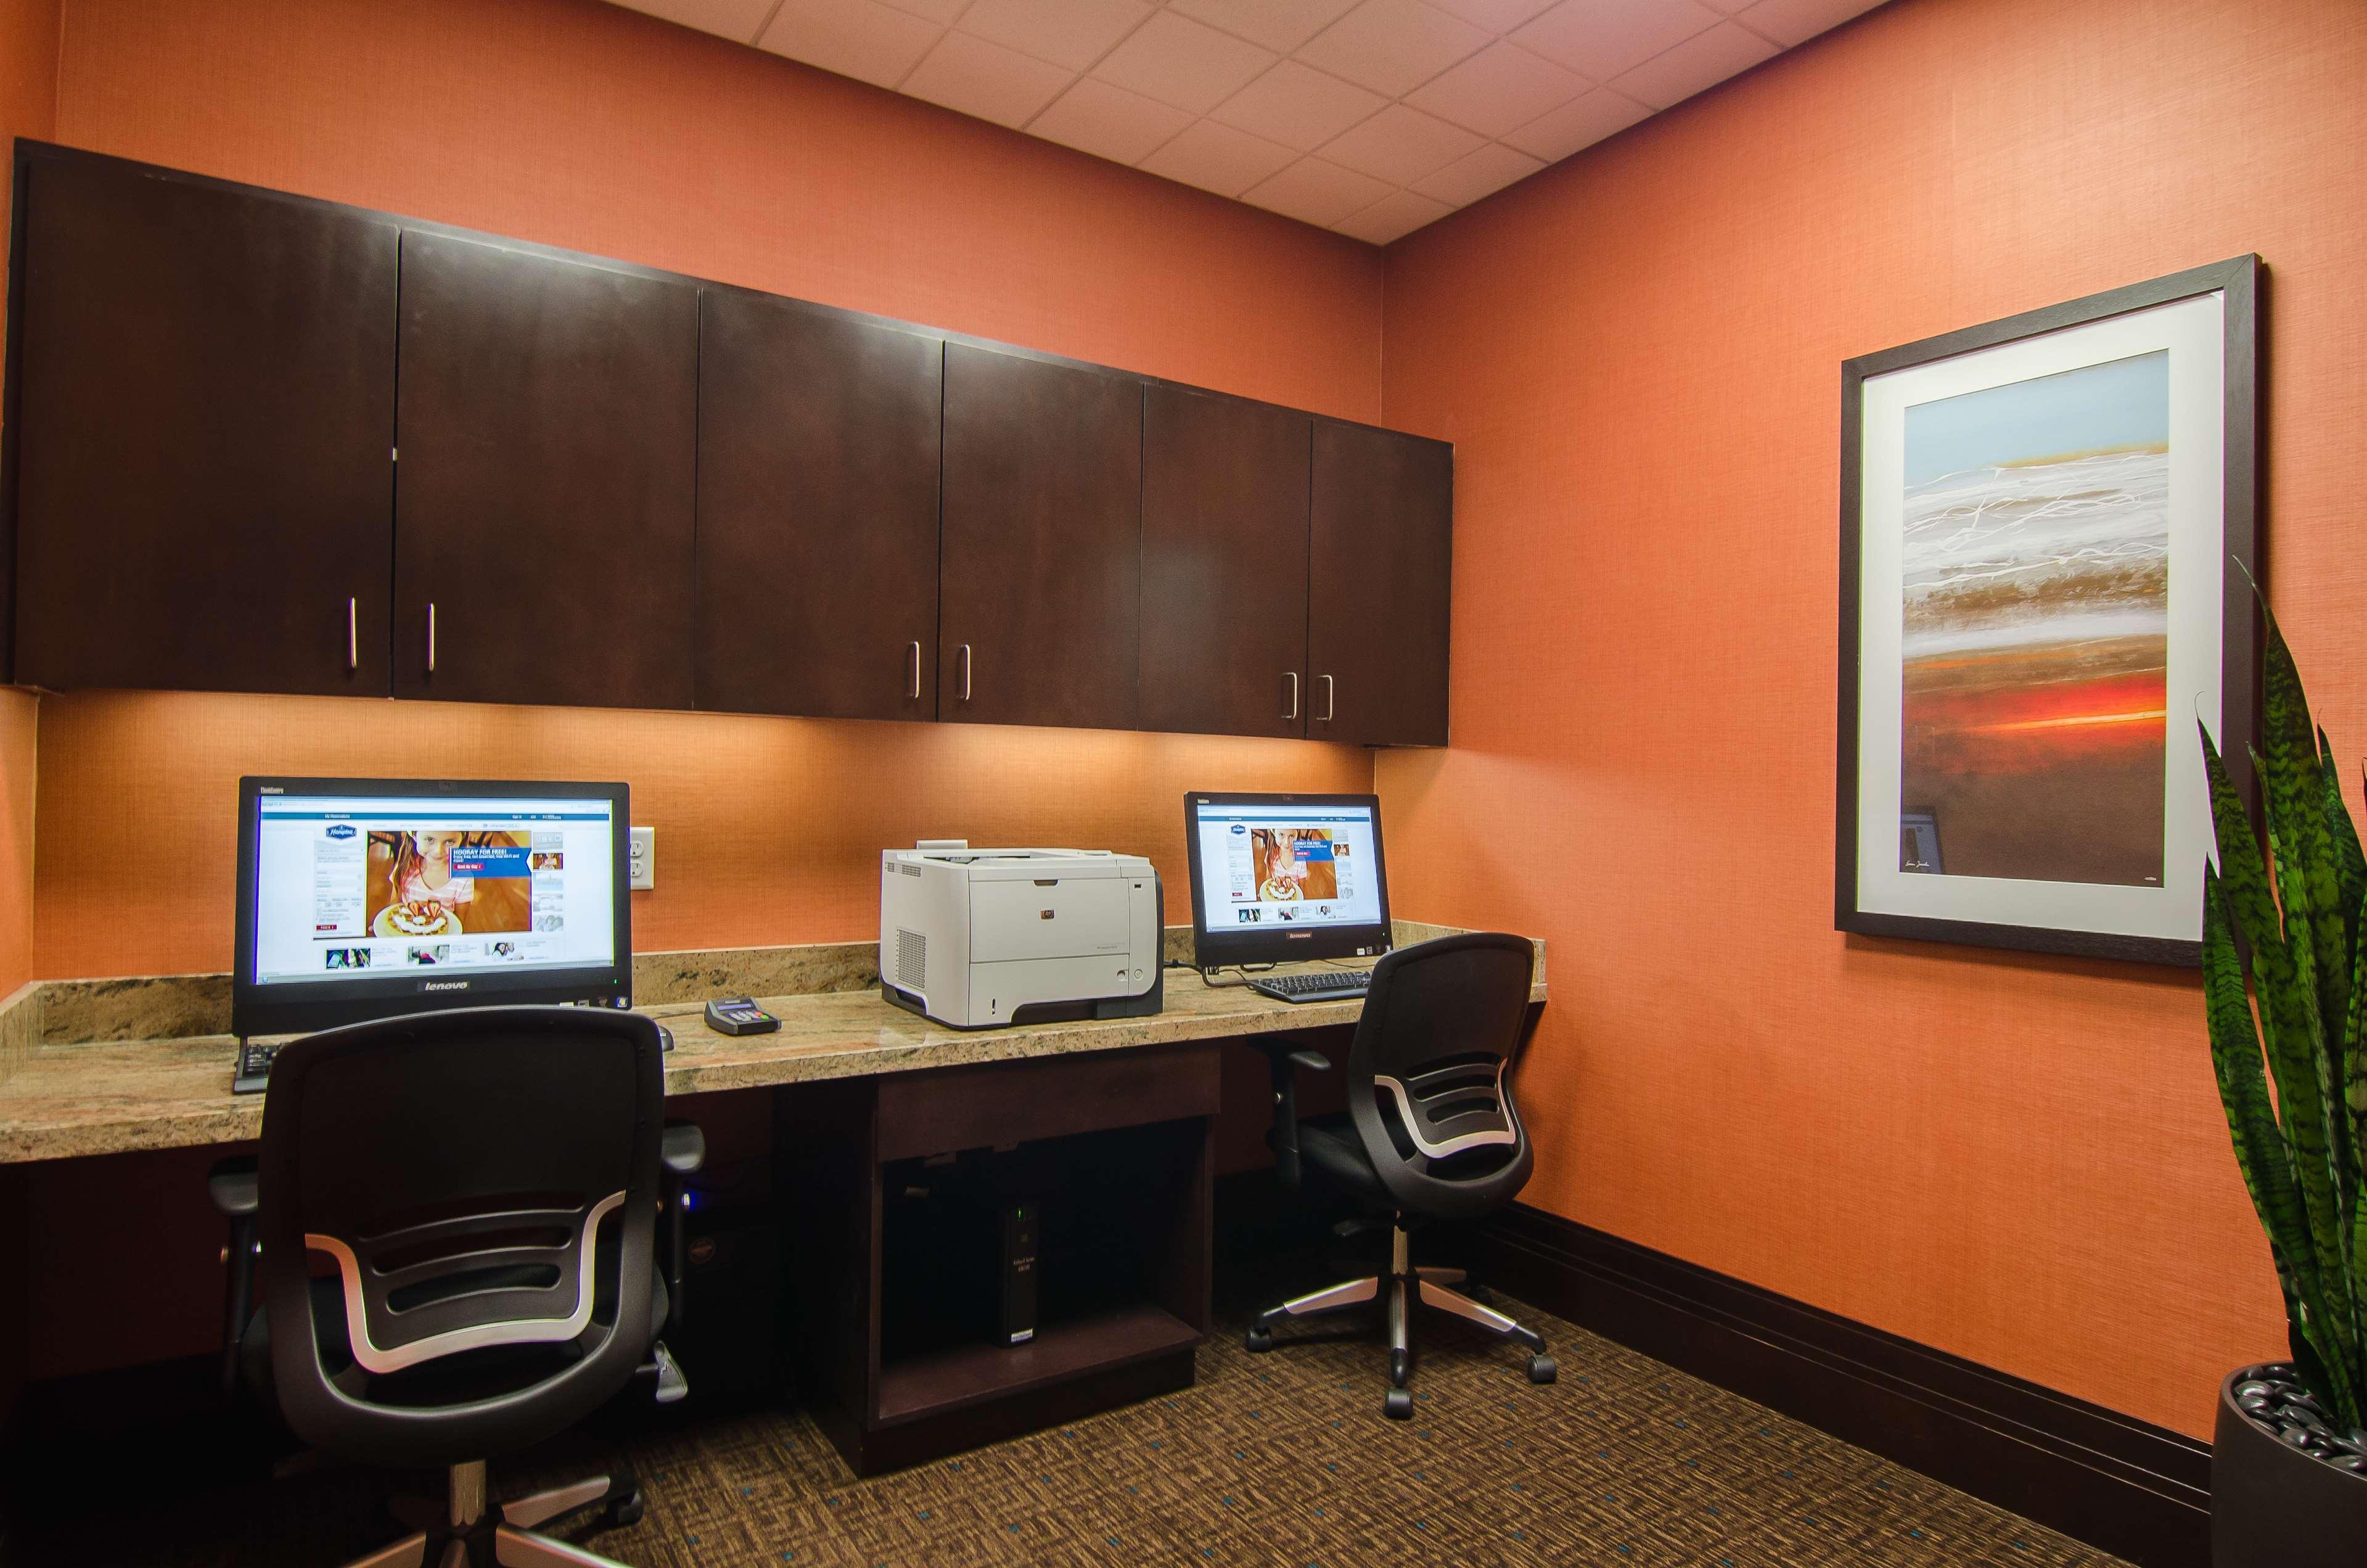 Hampton Inn & Suites Houston North IAH image 22